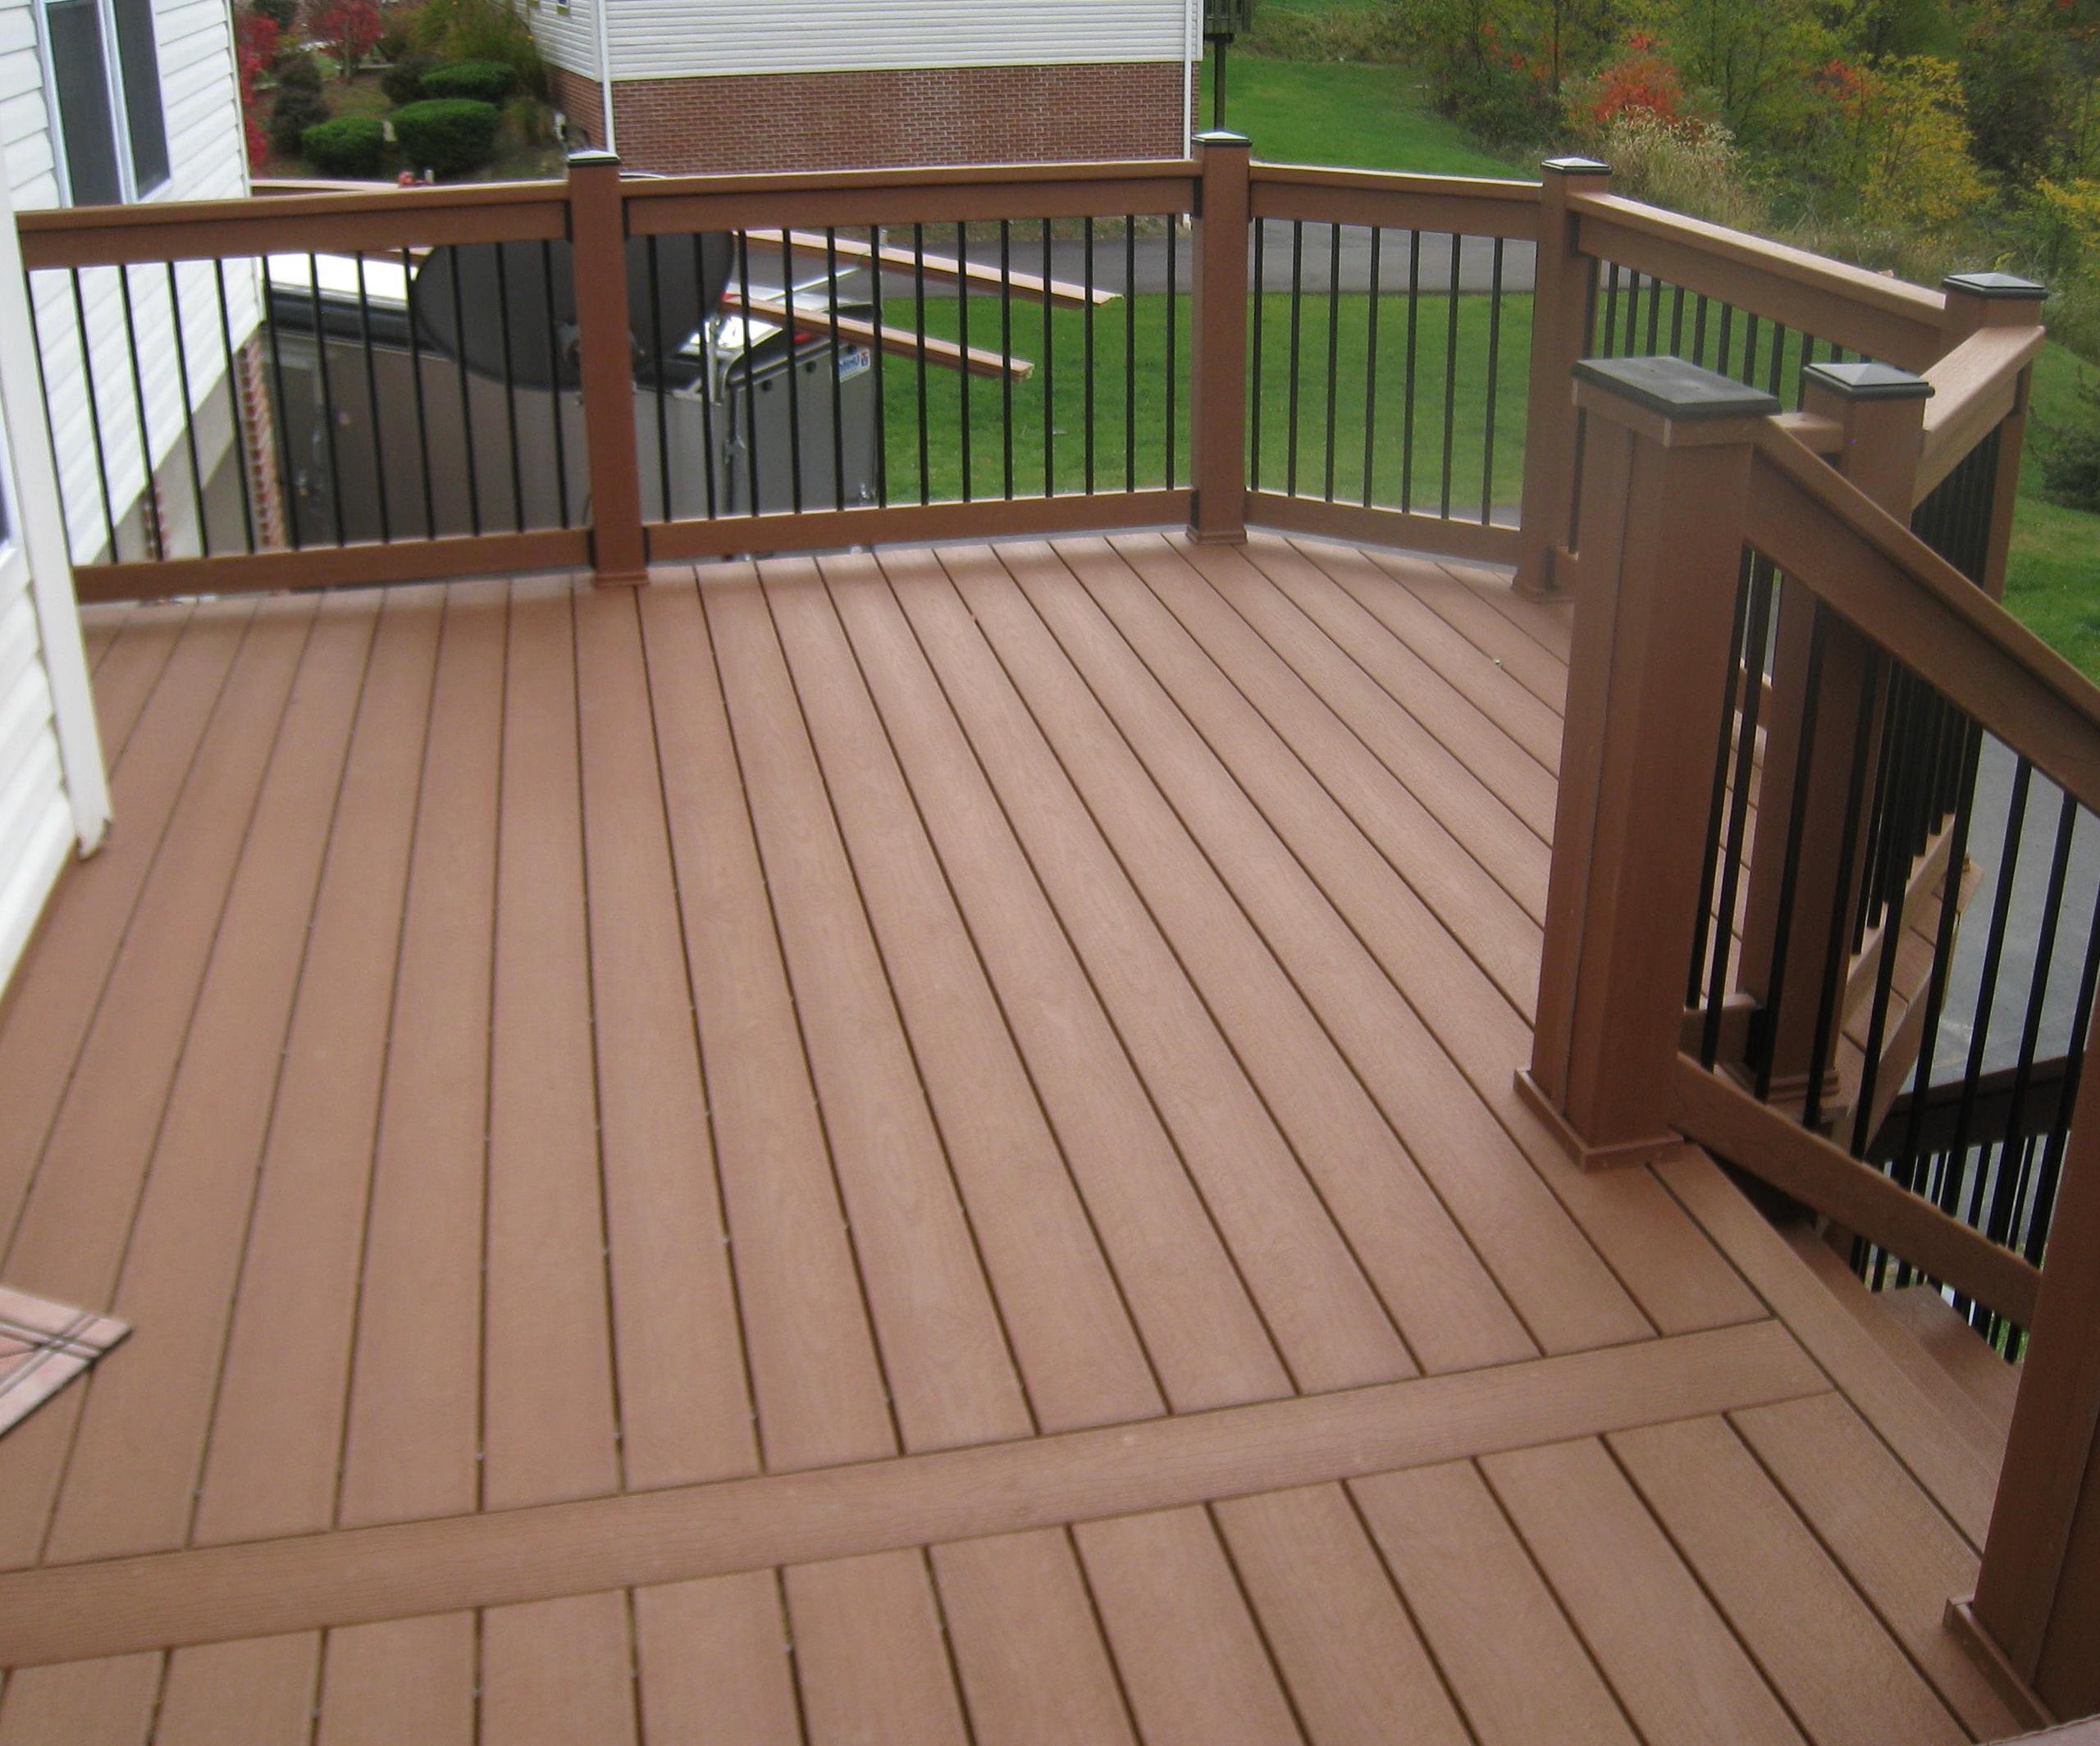 Wooden deck handrail designs home design ideas for Wood deck design plans